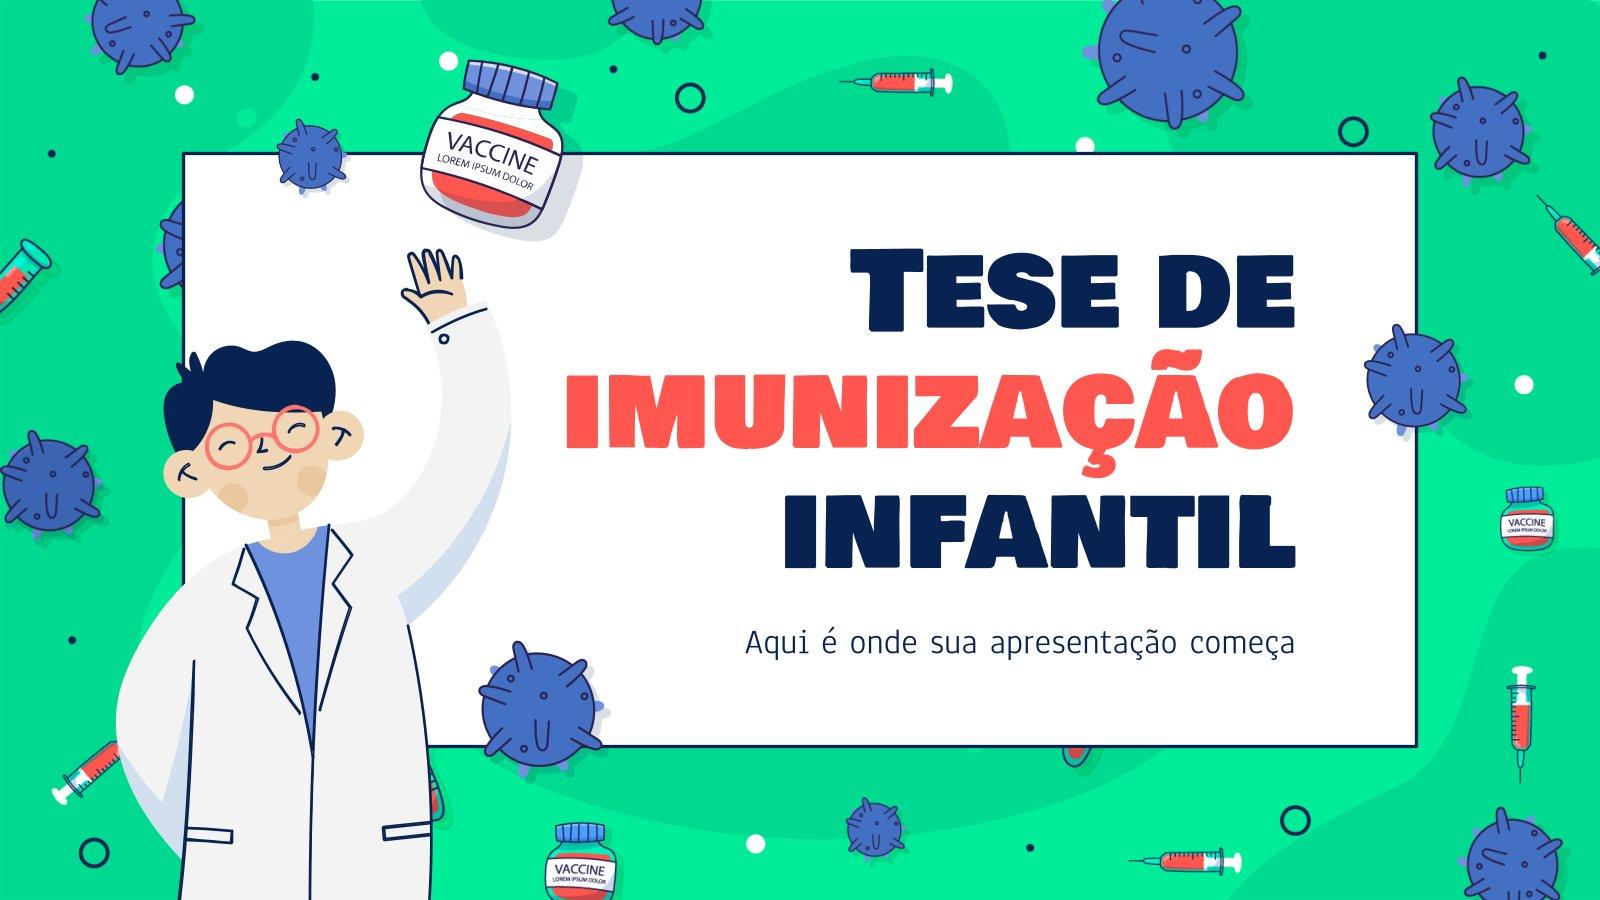 Tese de imunização infantil Präsentationsvorlage